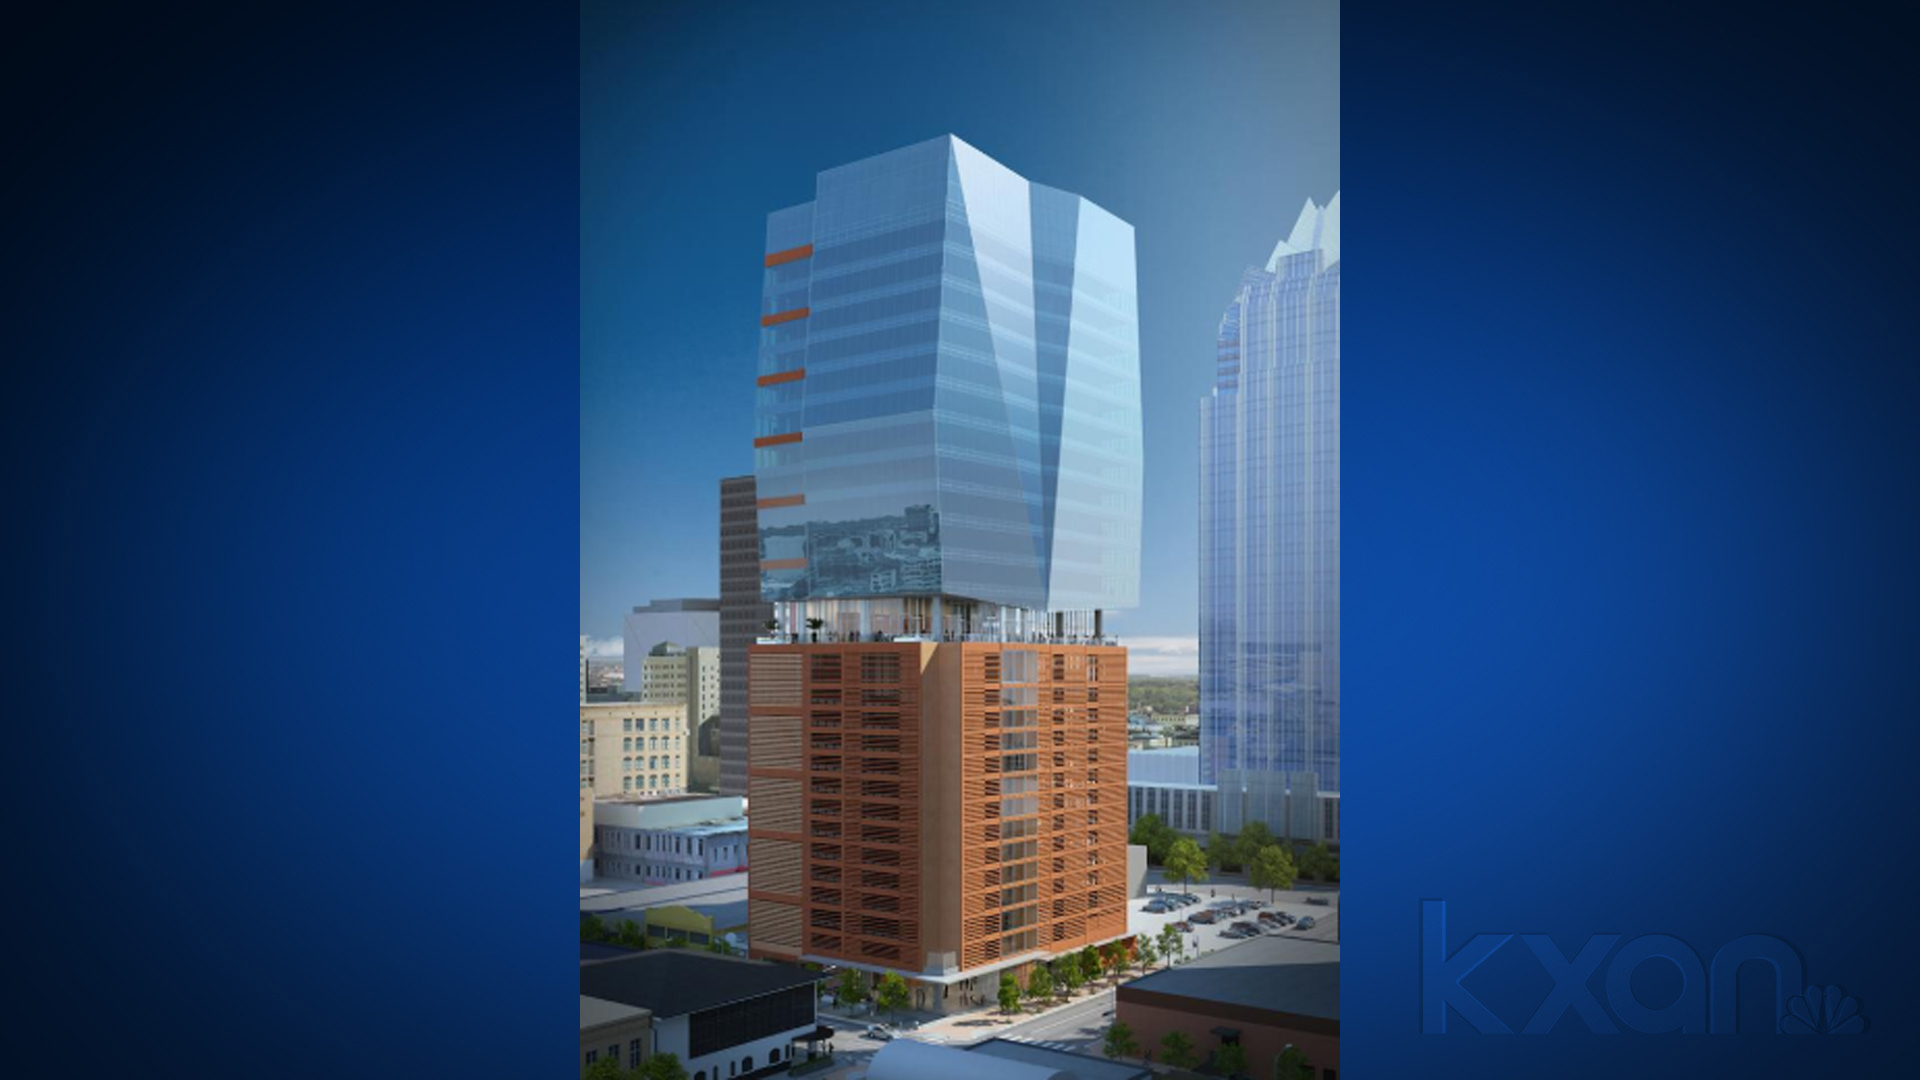 building-in-downtown-austin_1558544841334.jpg